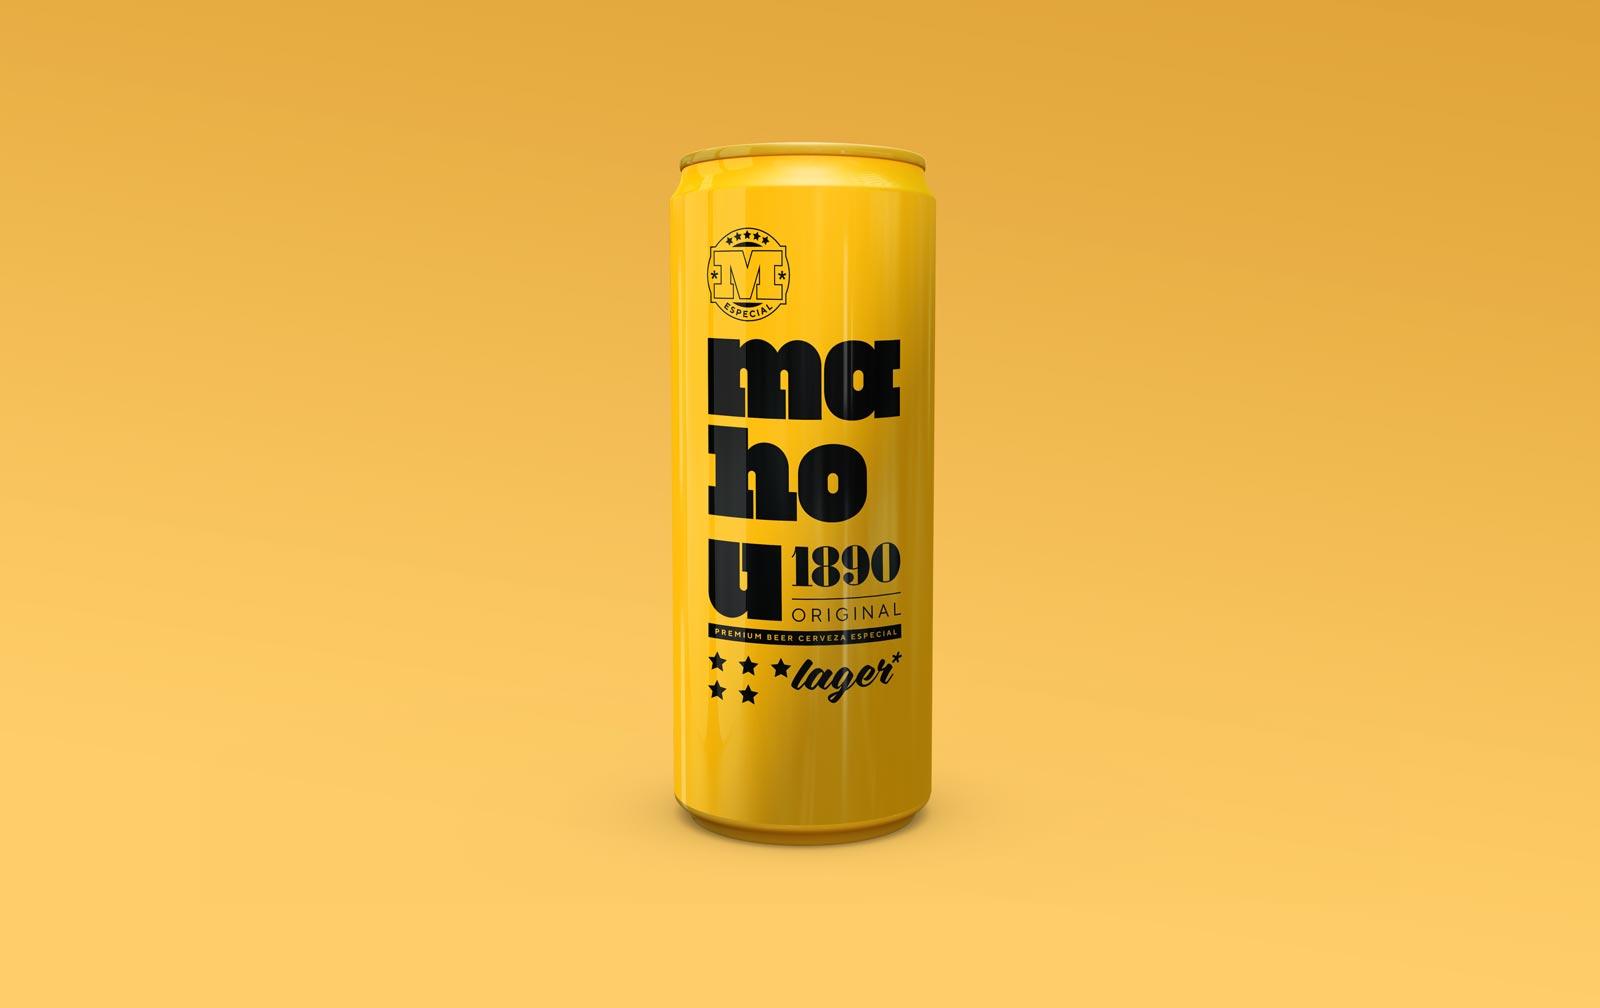 Mahou-Packaging-02